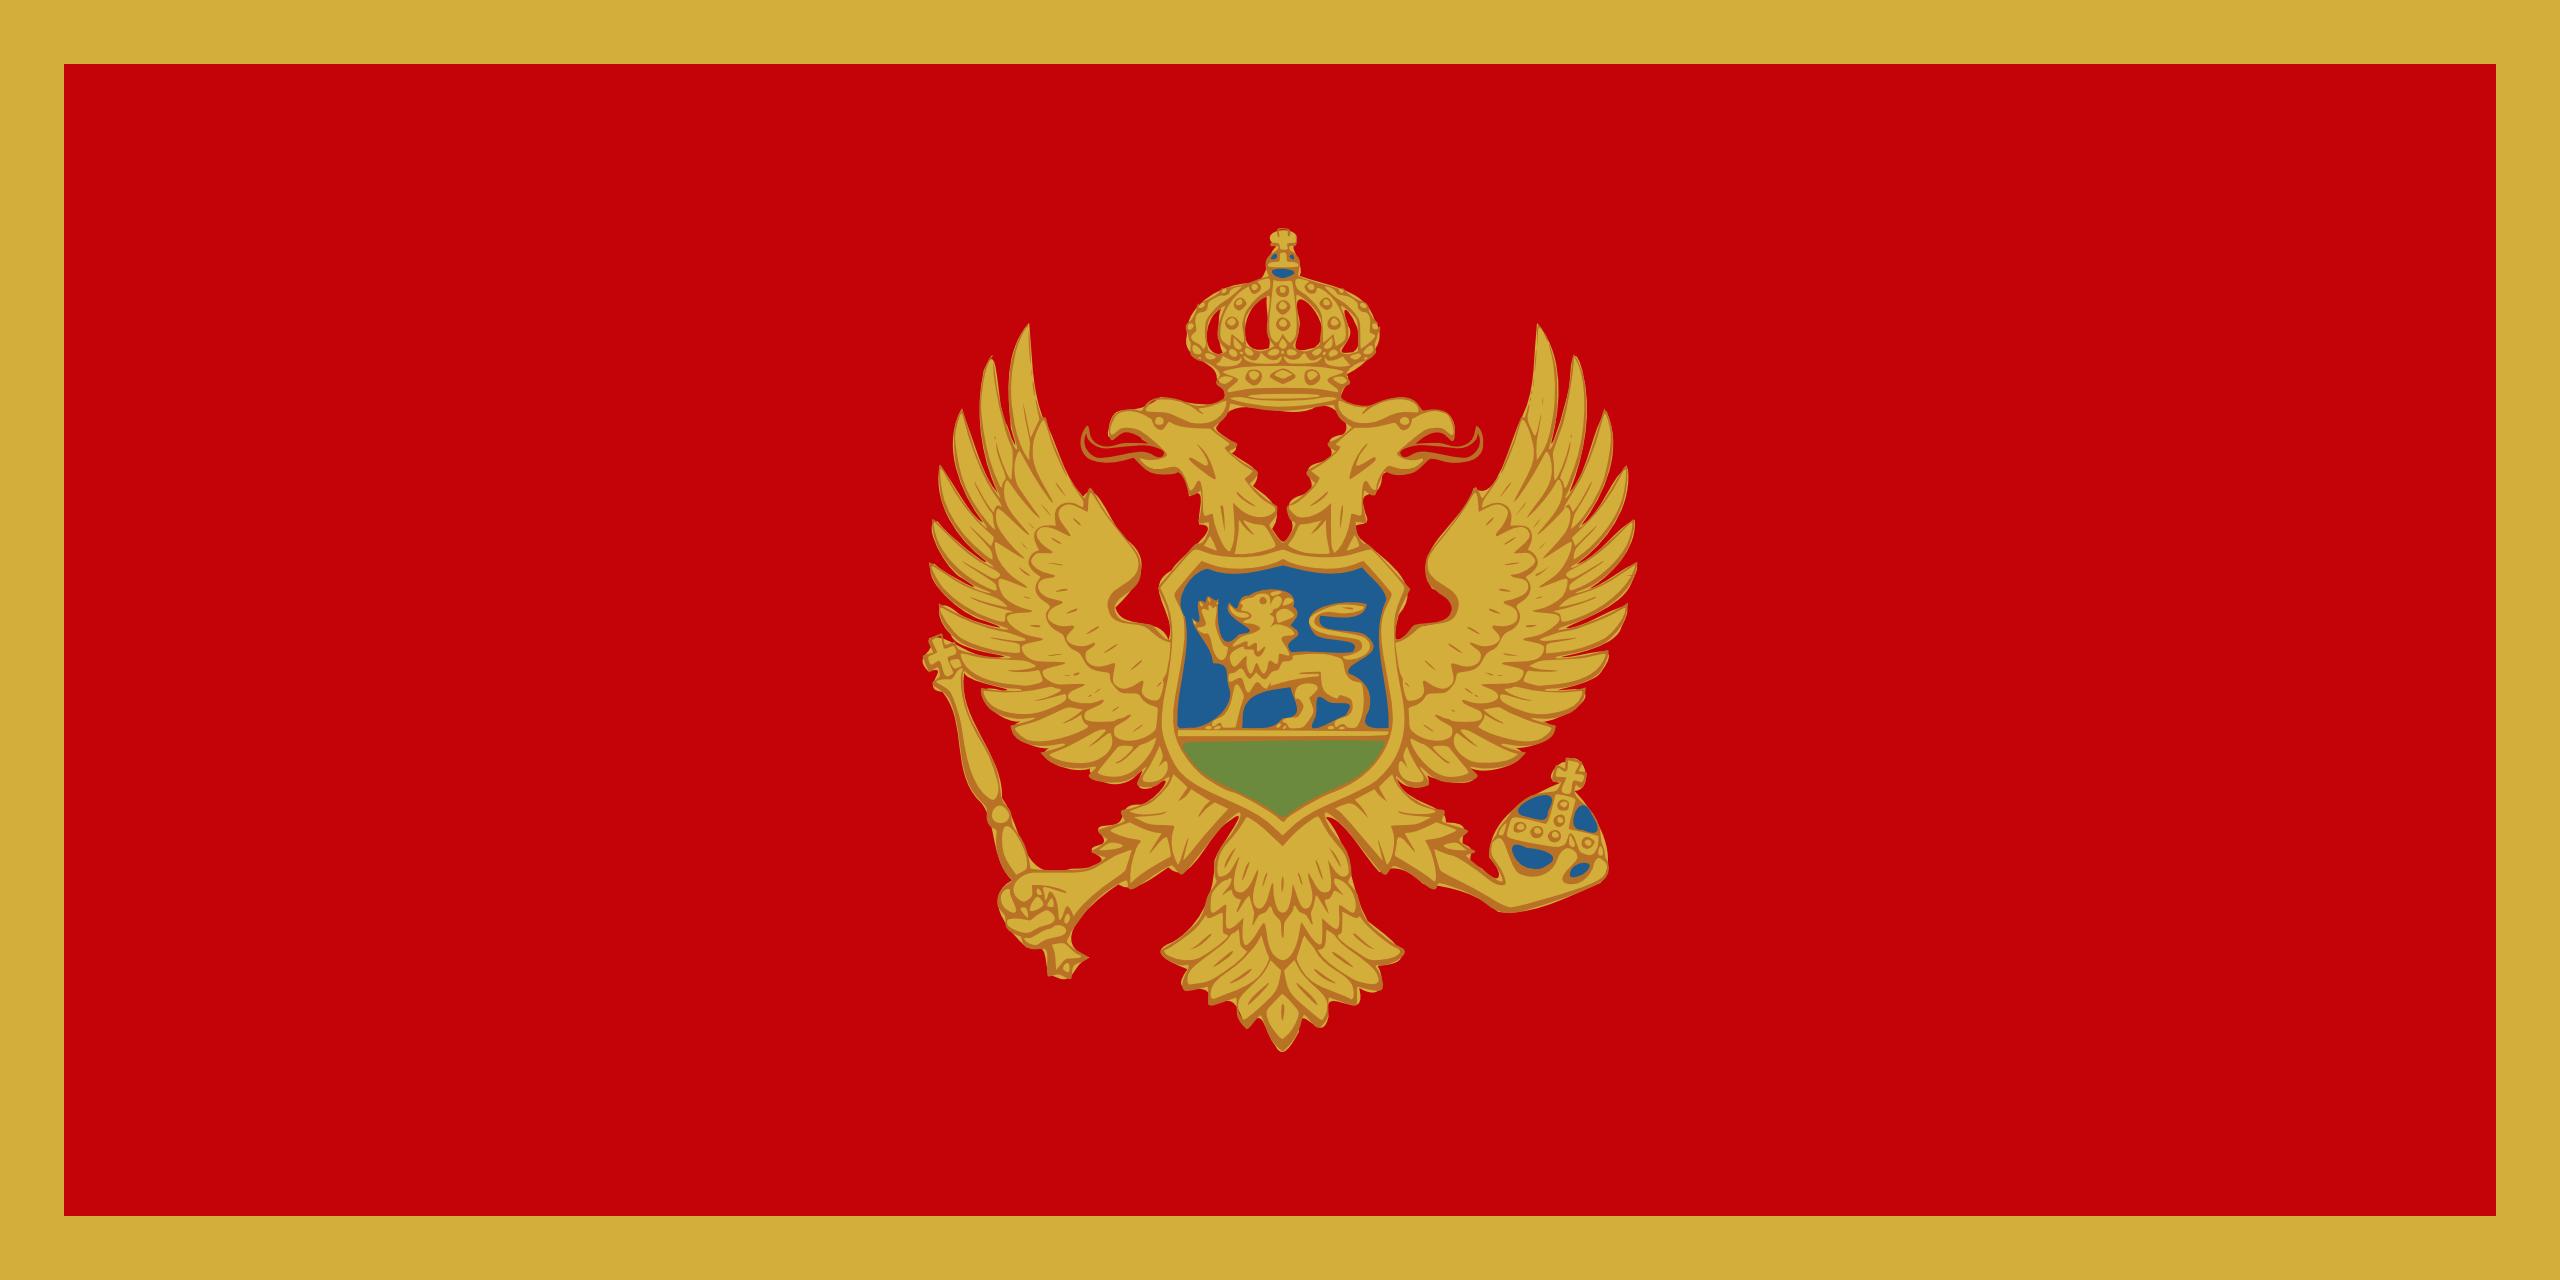 montenegro, देश, emblema, लोग�प्रतीकbolo - HD वॉलपेपर - प्रोफेसर-falken.com